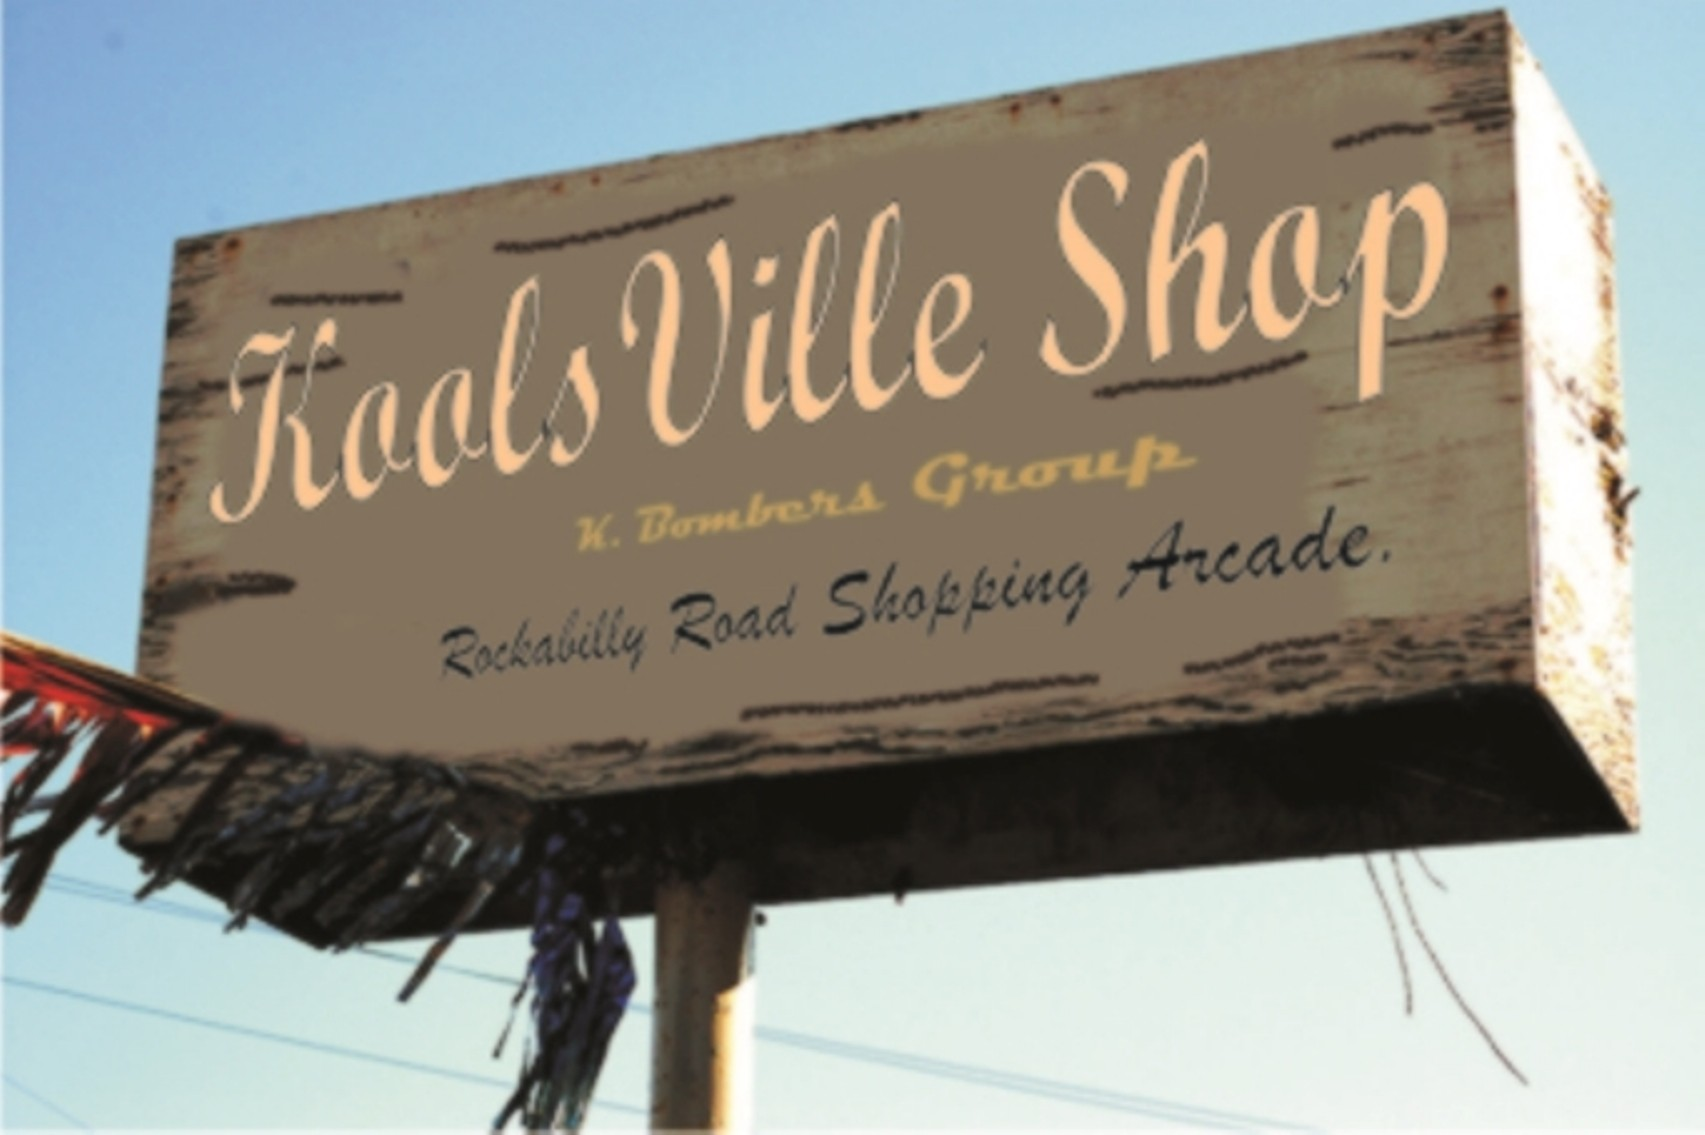 Koolsville Shop